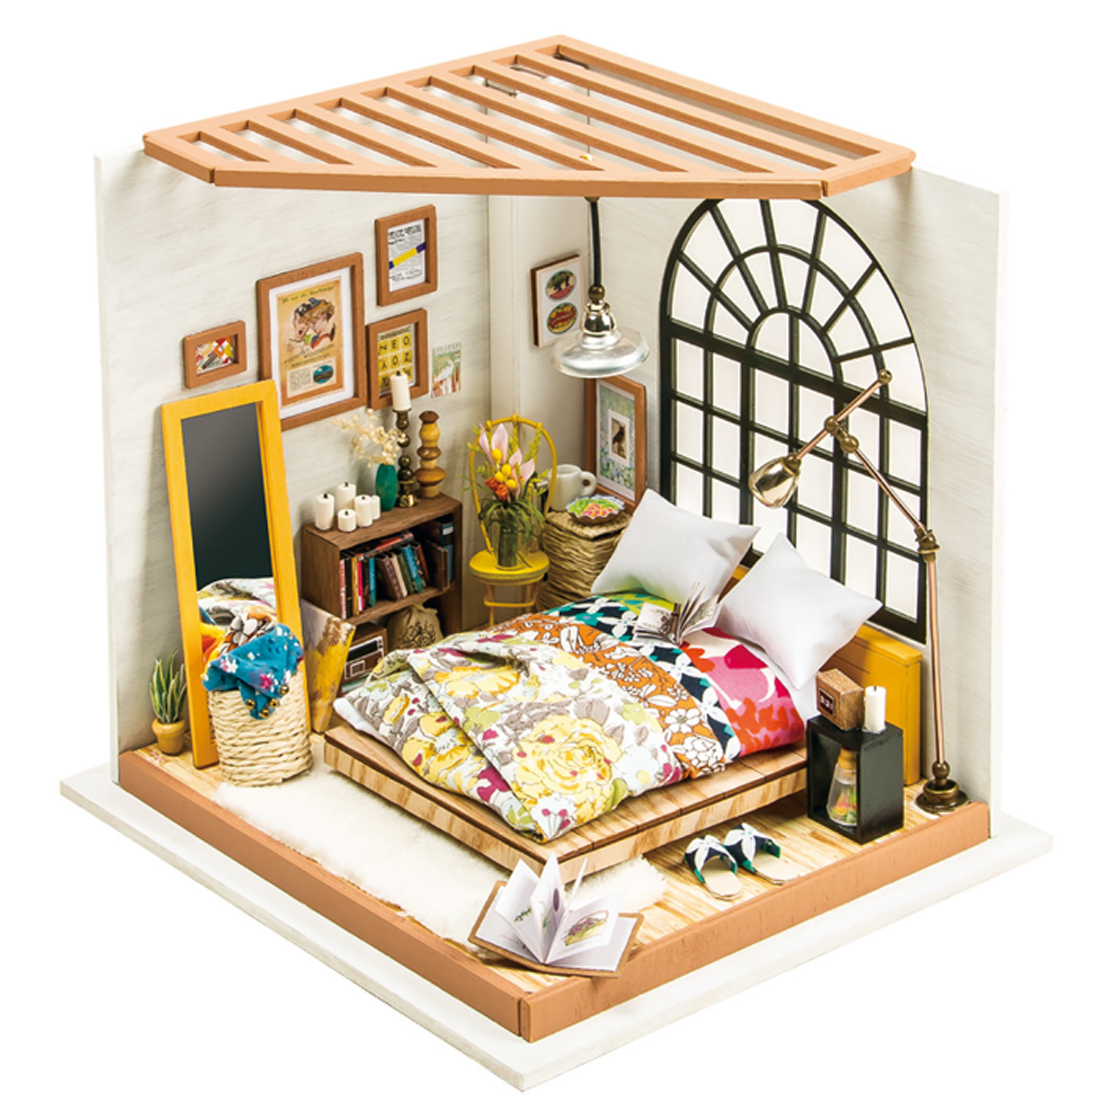 Robotime Manual Assembly DIY Dollhouse Alice's Dreamy Bedroom with LED Light Stem Toys for Home Decoraction комплект белья mona liza stone topaz 2 спальный наволочки 50x70 552205 65